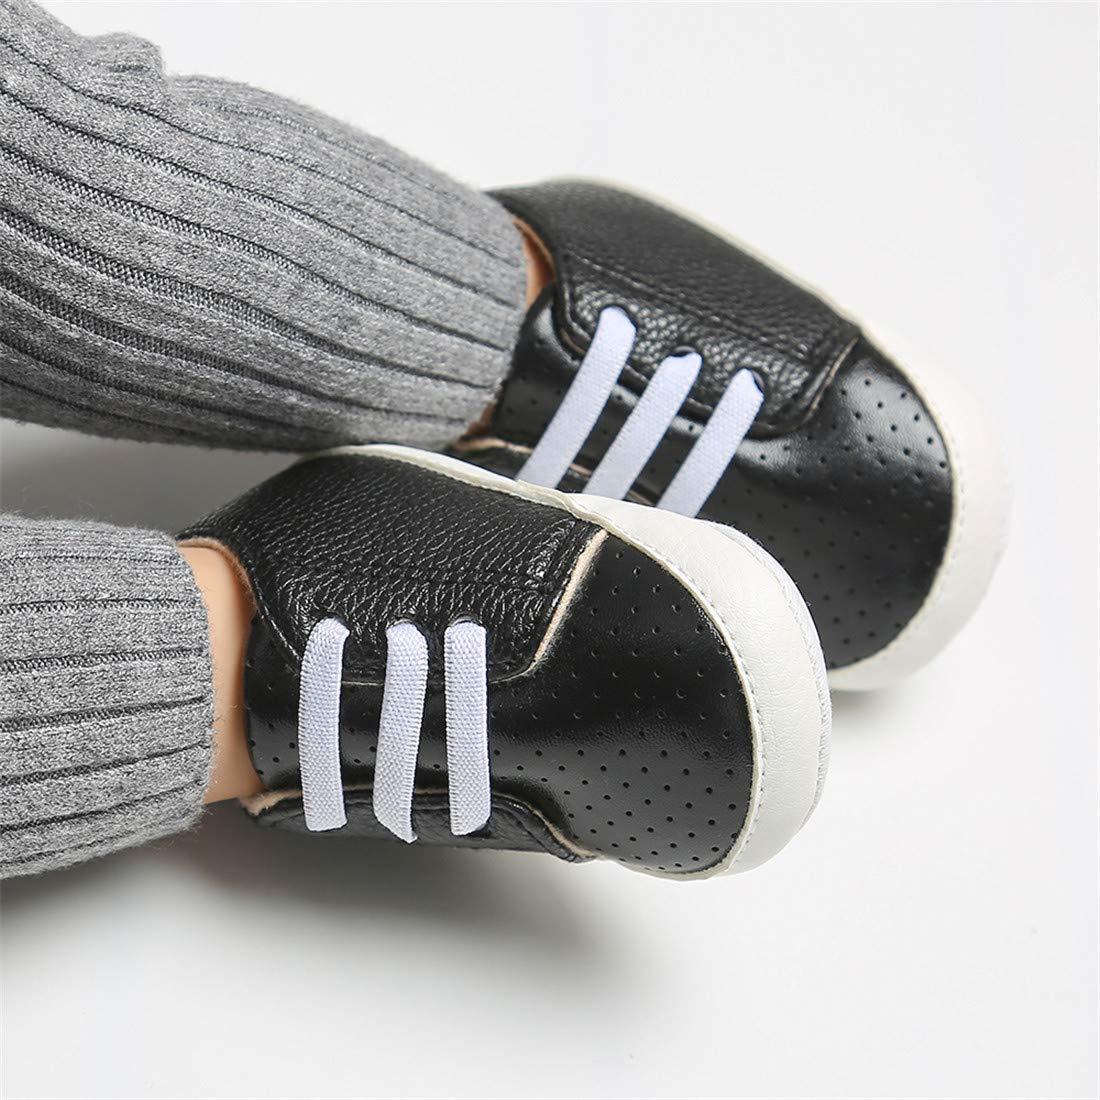 LAFEGEN Newborn Baby Boys Girls Sneakers PU Leather Anti-Slip Soft Sole Infant Toddler First Walker Crib Shoes